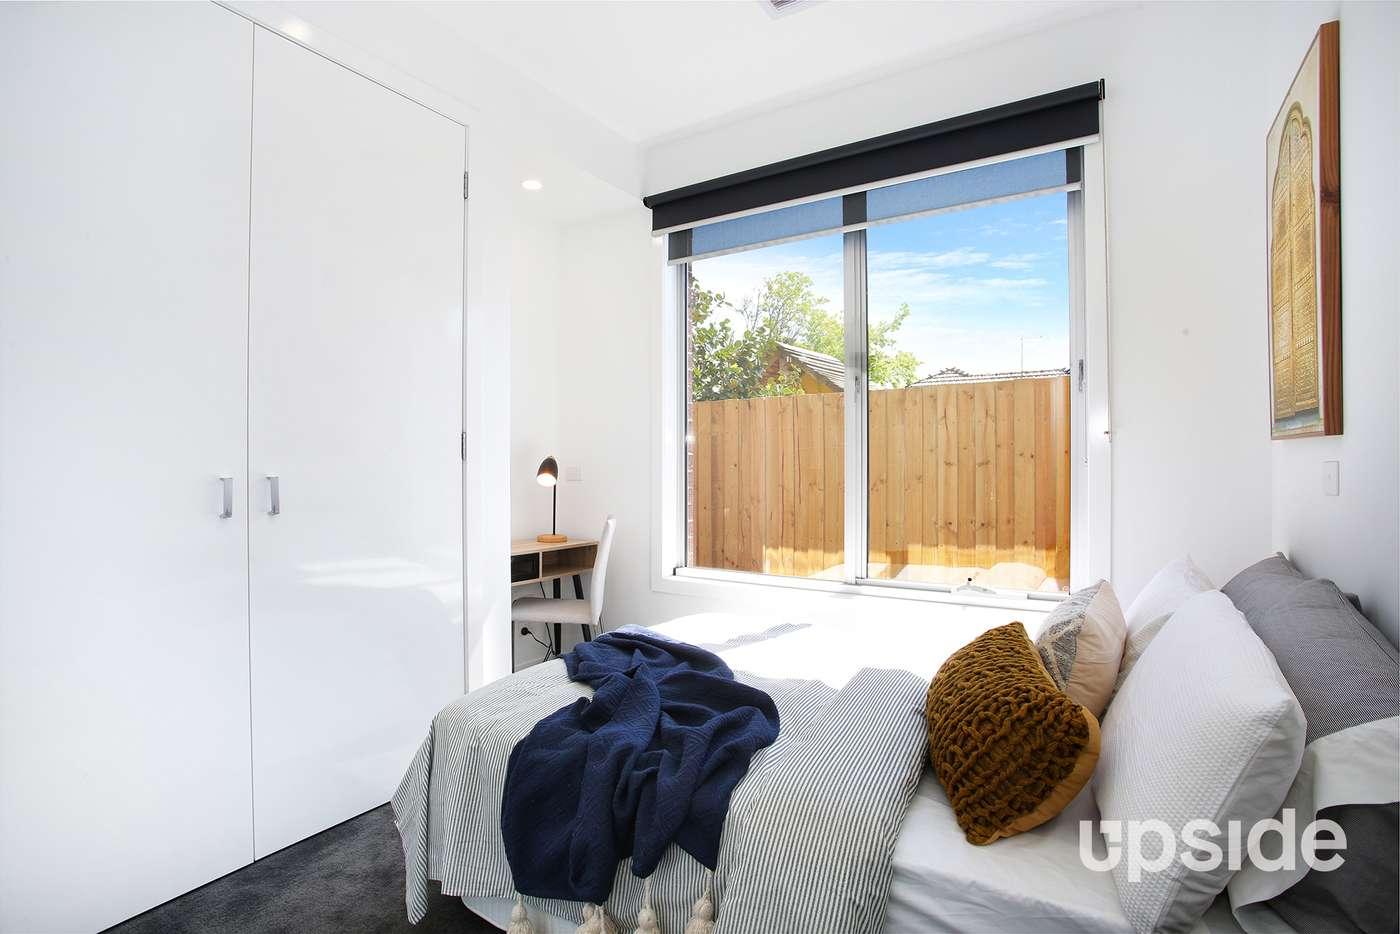 Sixth view of Homely unit listing, 2/26 Mckellar Street, Watsonia VIC 3087